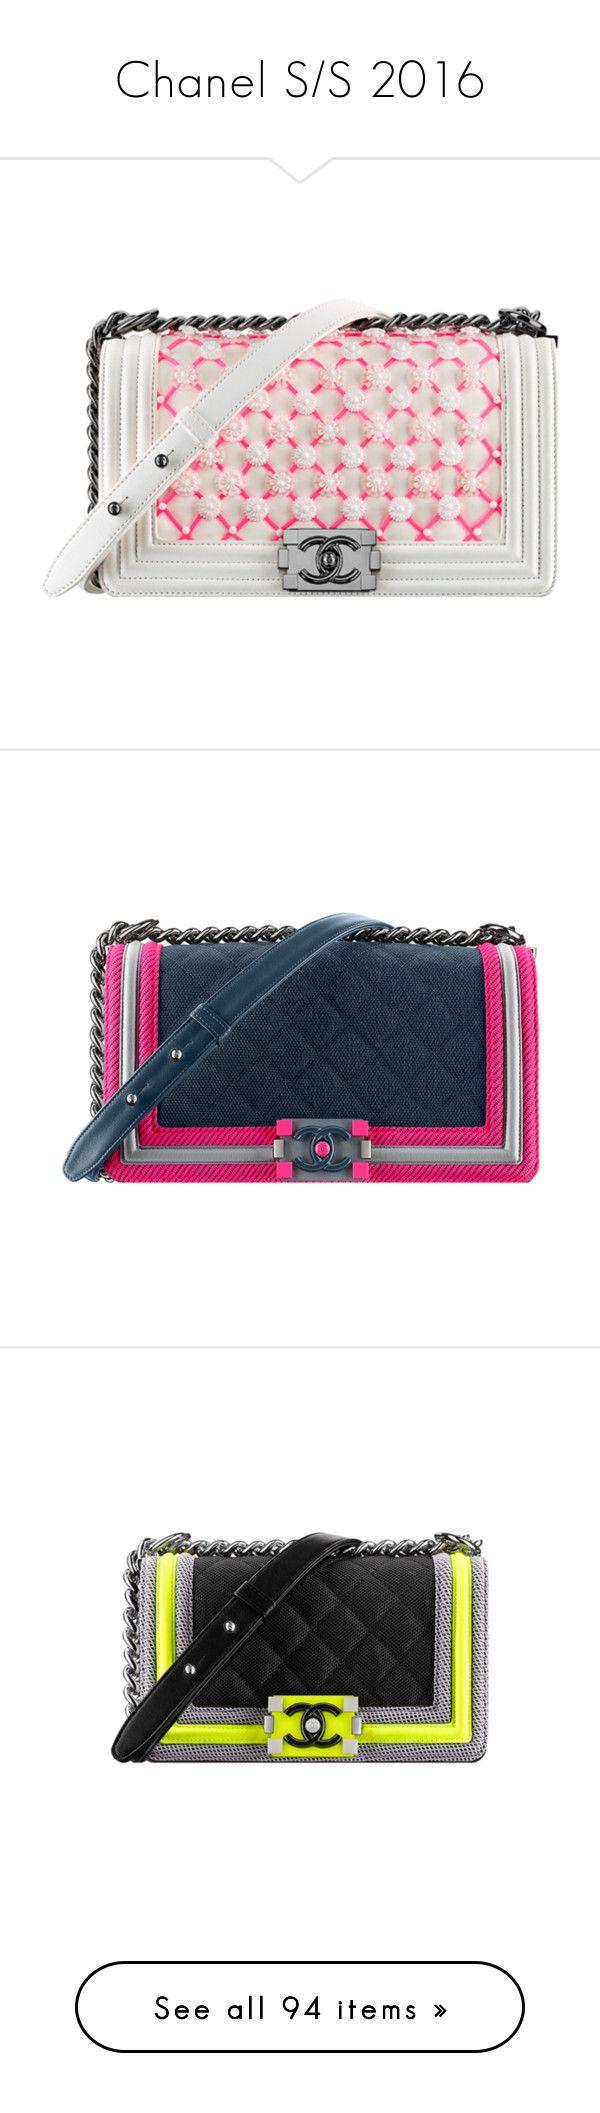 """Chanel S/S 2016"" by mariotsala22 ❤ liked on Polyvore featuring chanel, bags, handbags, bolsa, shopper handbags, chanel bags, shopping tote bags, chanel handbags, flap bag and handbags purses"